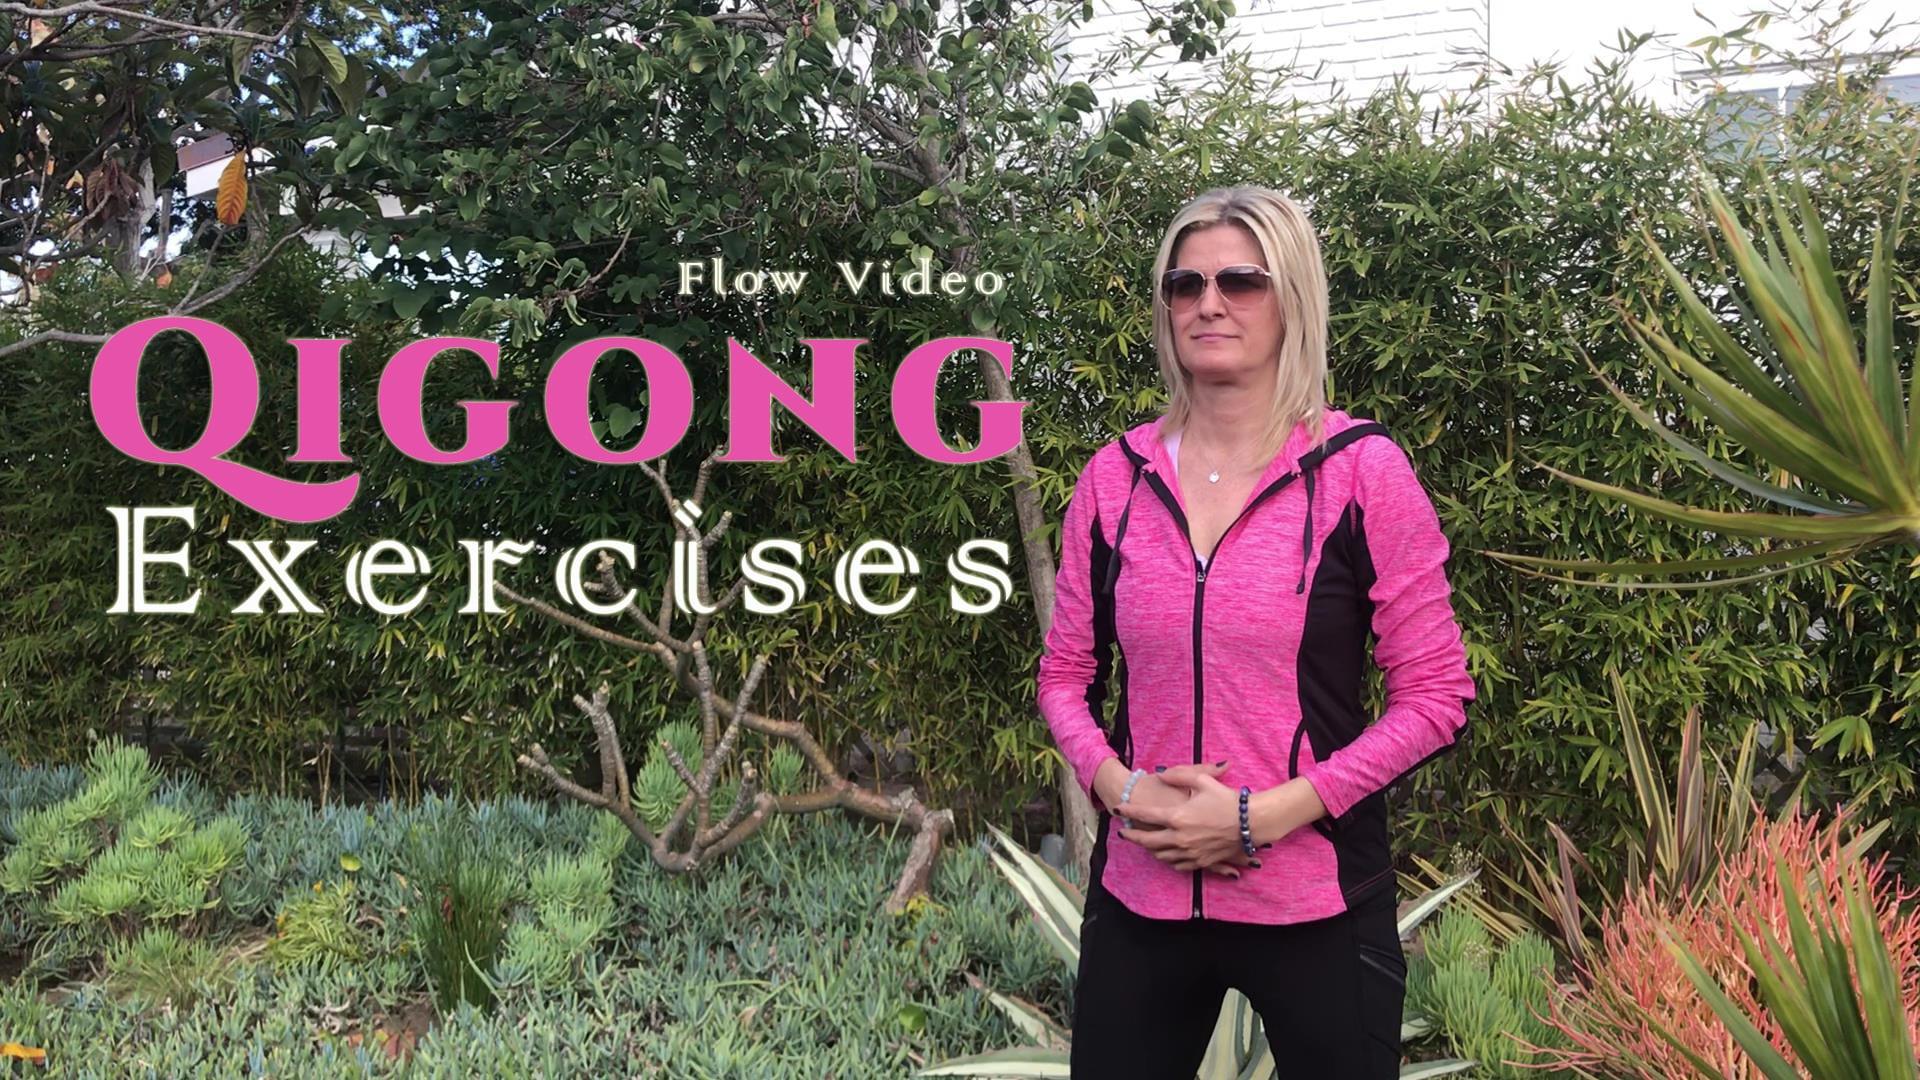 Qigong Exercises – Flow Video